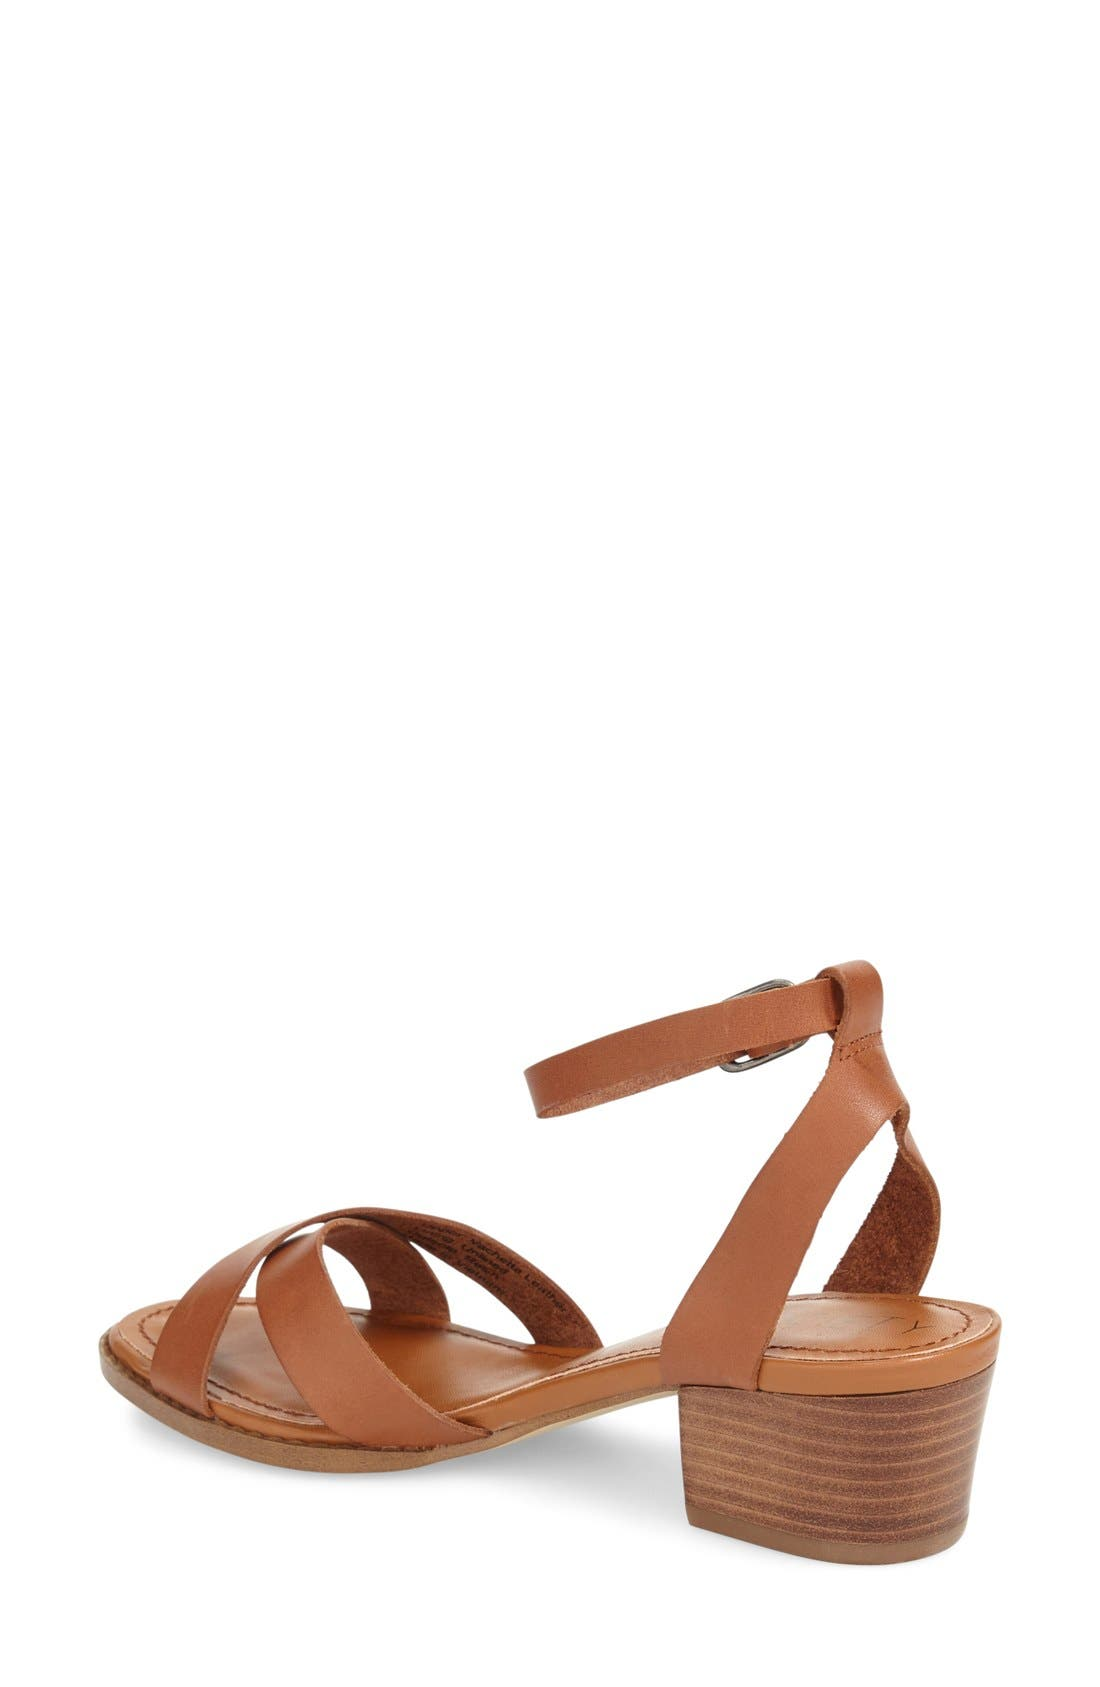 Alternate Image 2  - Sole Society 'Savannah' Sandal (Women)